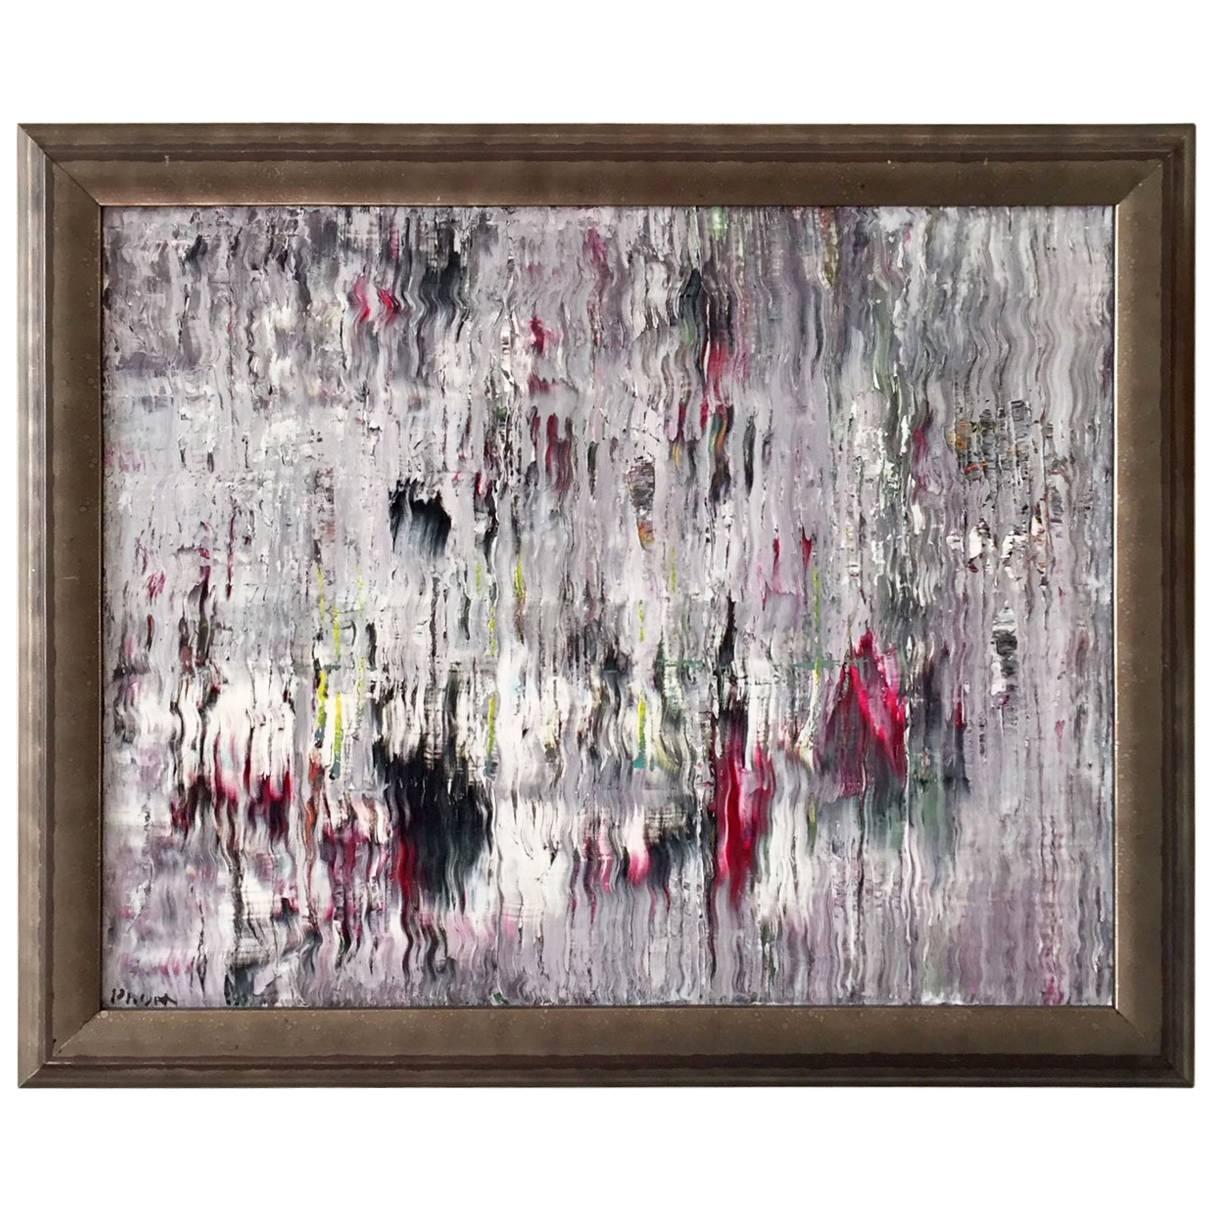 Caravan Acrylic on Canvas Abstract Painting Framed Andrew Plum